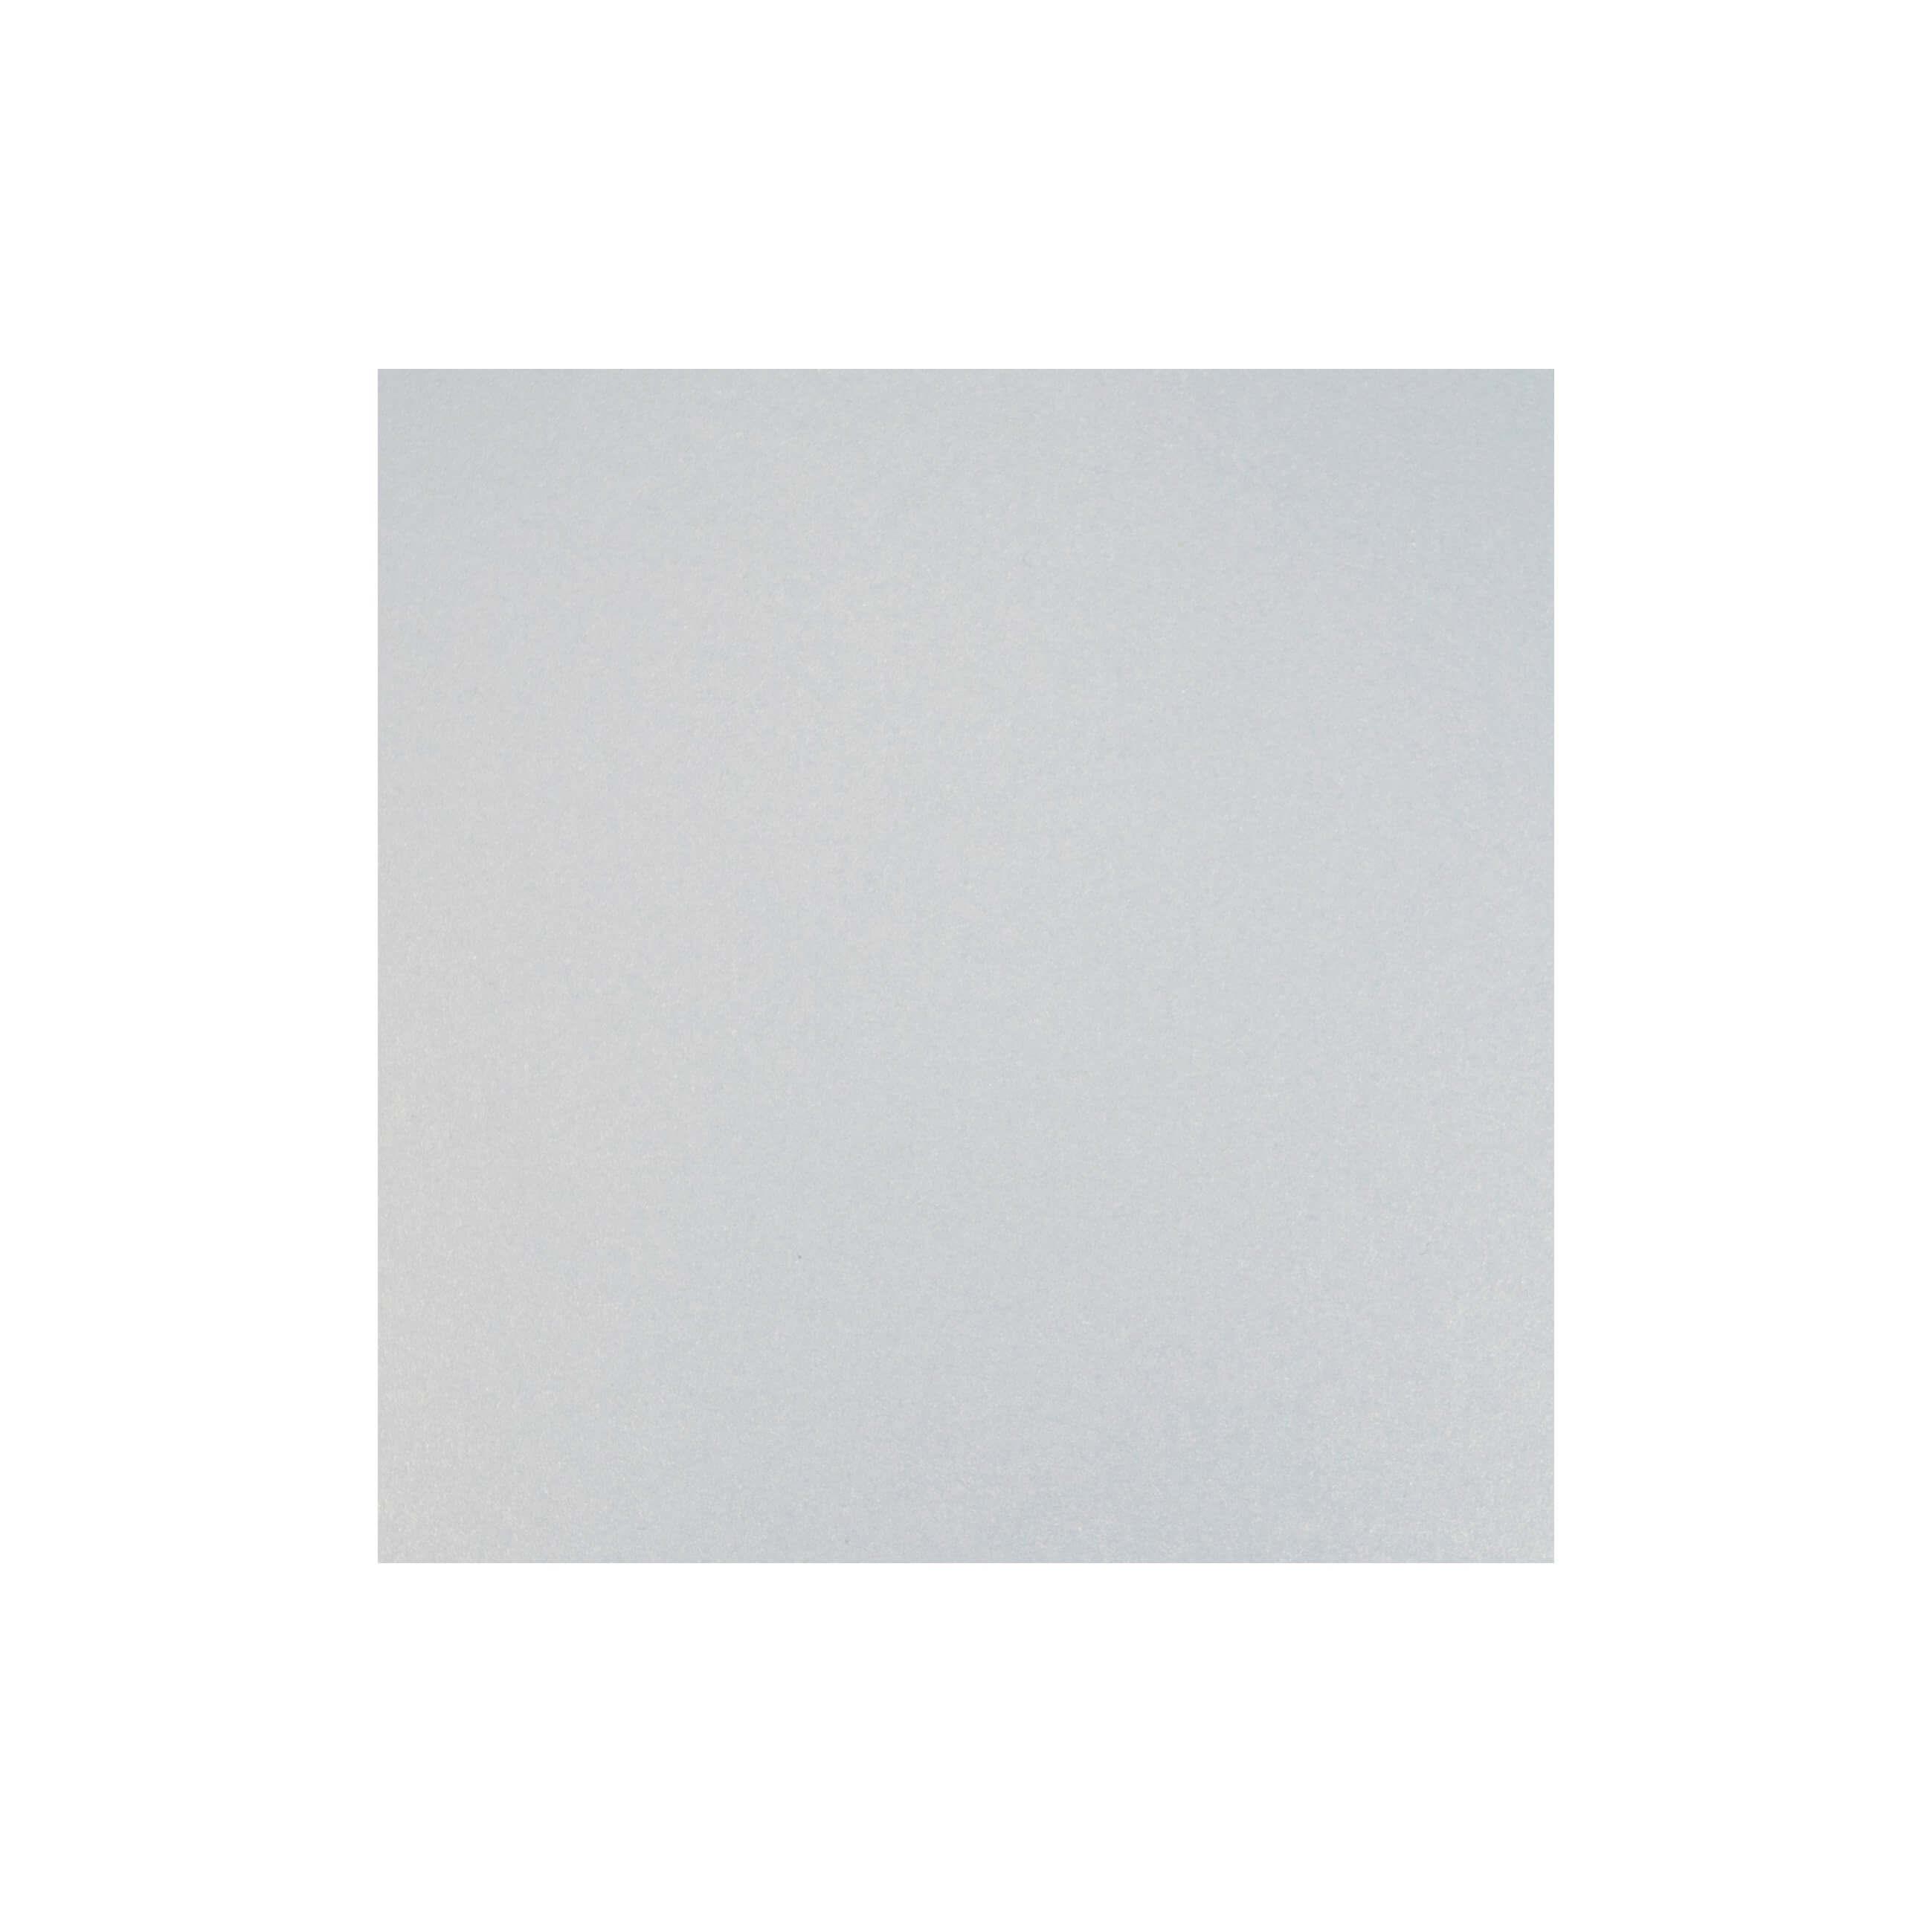 Enfolio Wallet 146mm Sq Cardpull Top - White Lustre